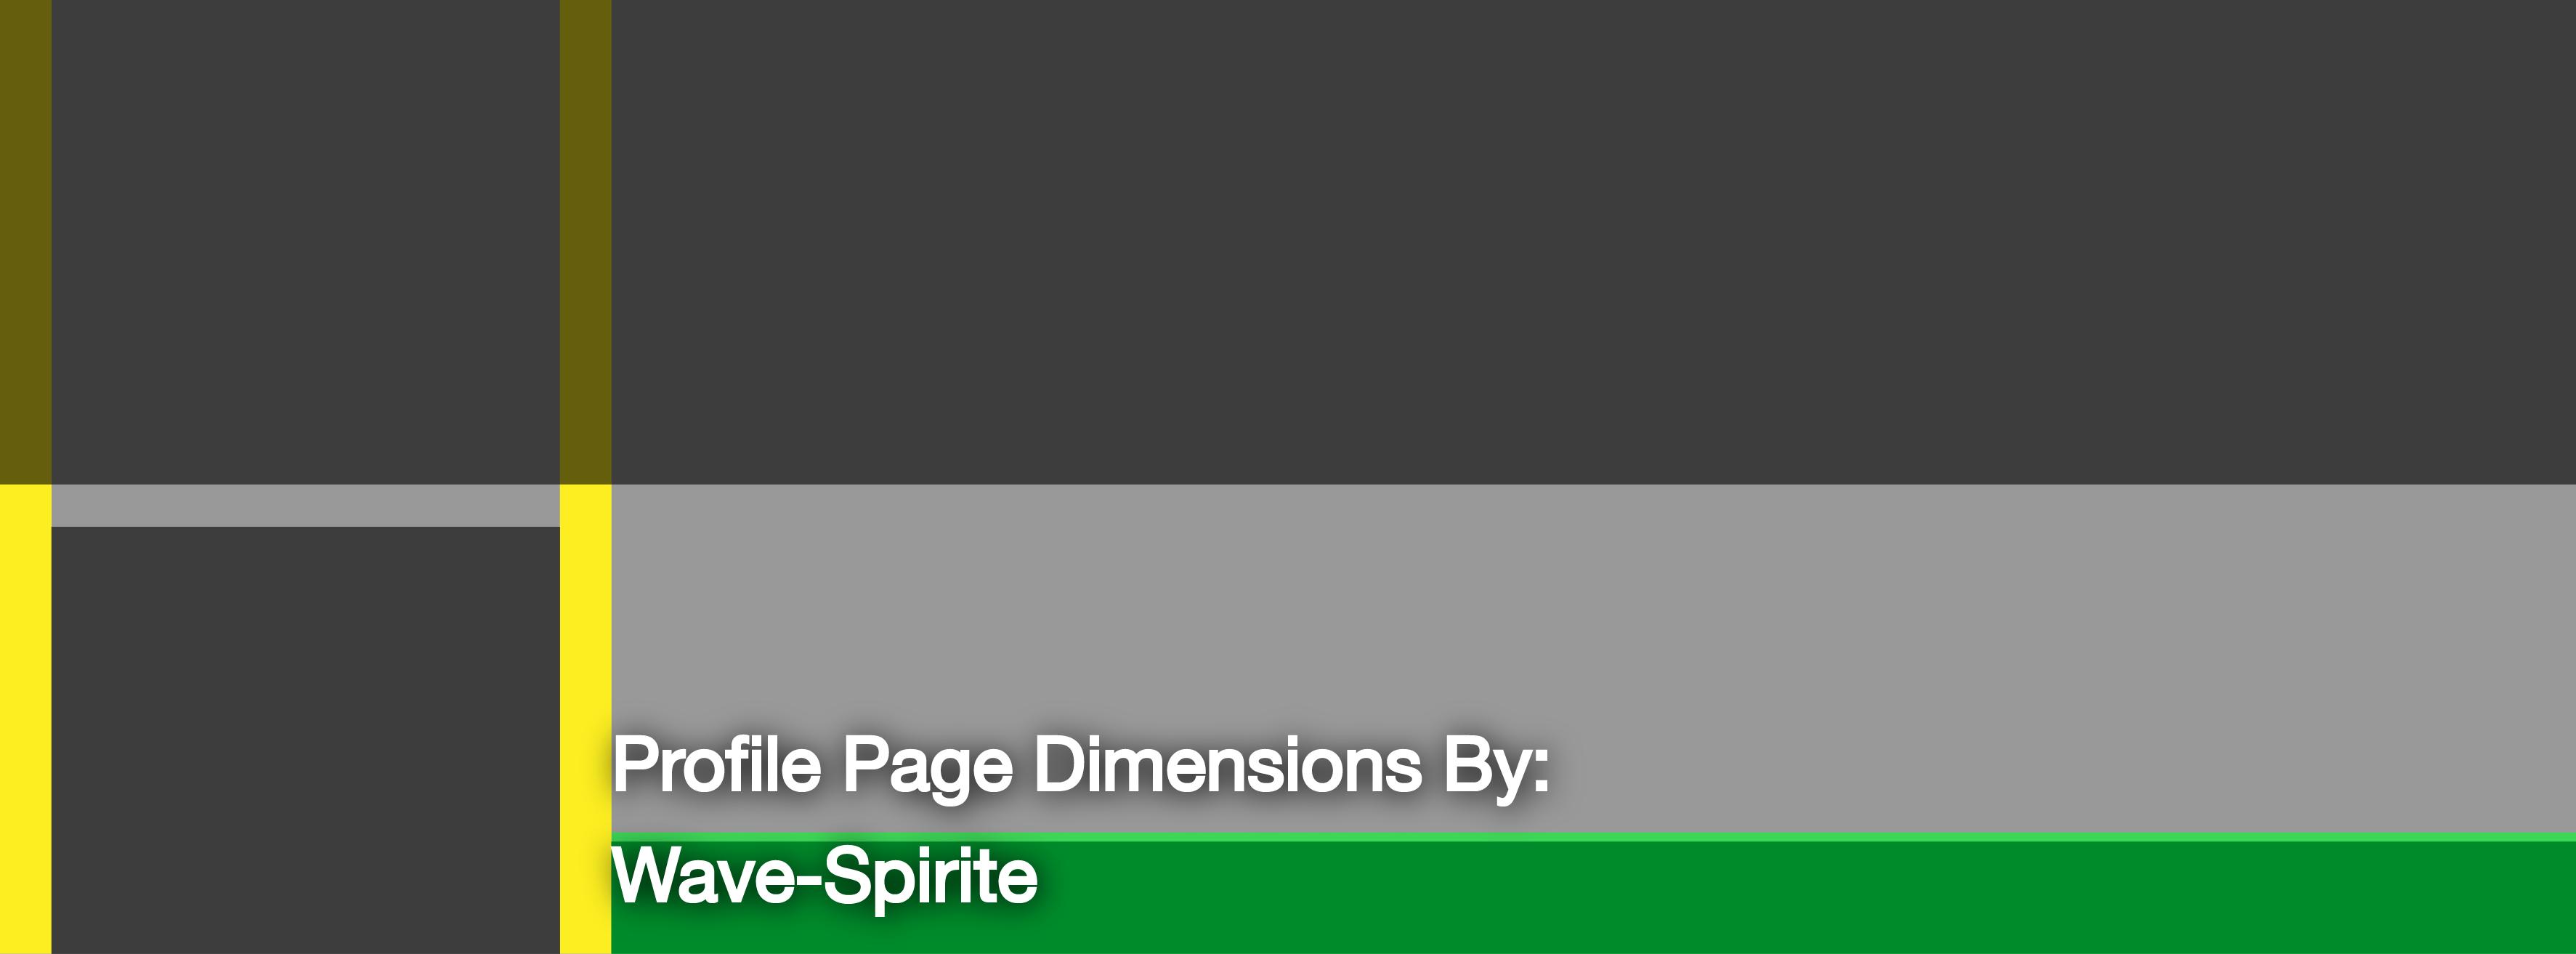 facebook profile page cover dimensions template by wave spirit on deviantart. Black Bedroom Furniture Sets. Home Design Ideas